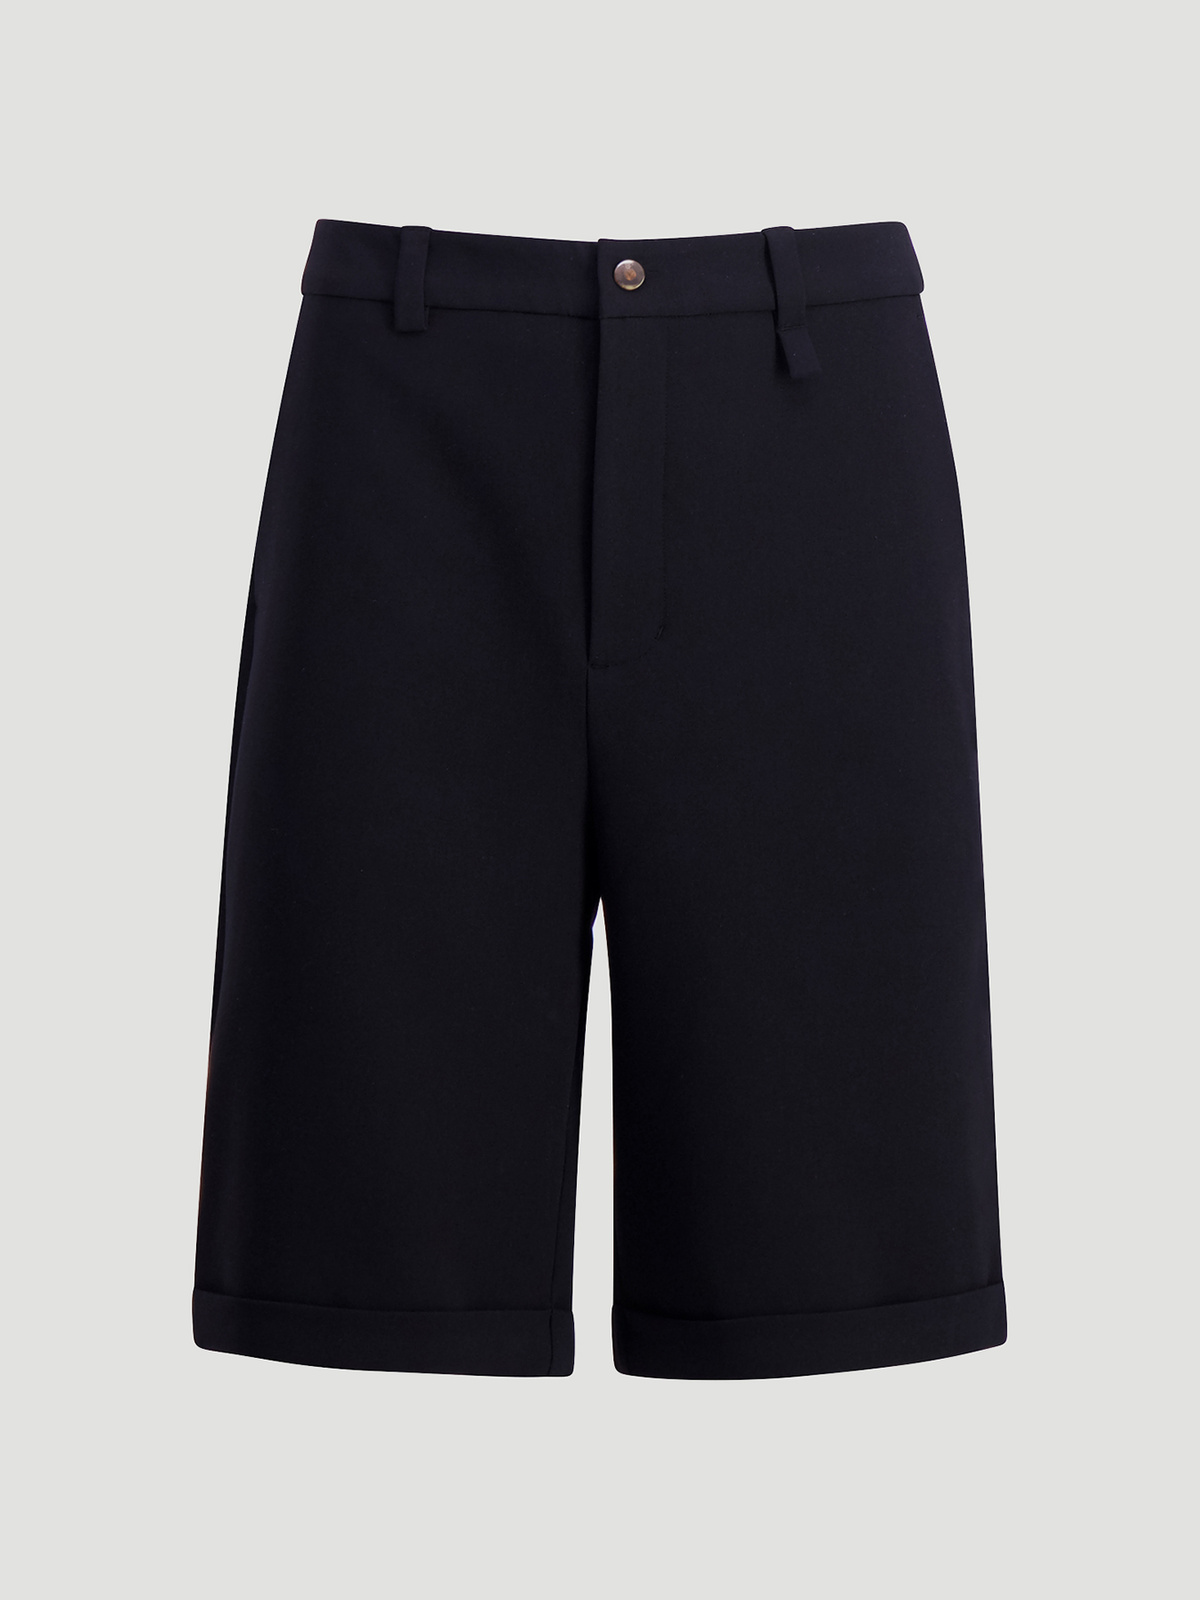 Temo Shorts  Black 3